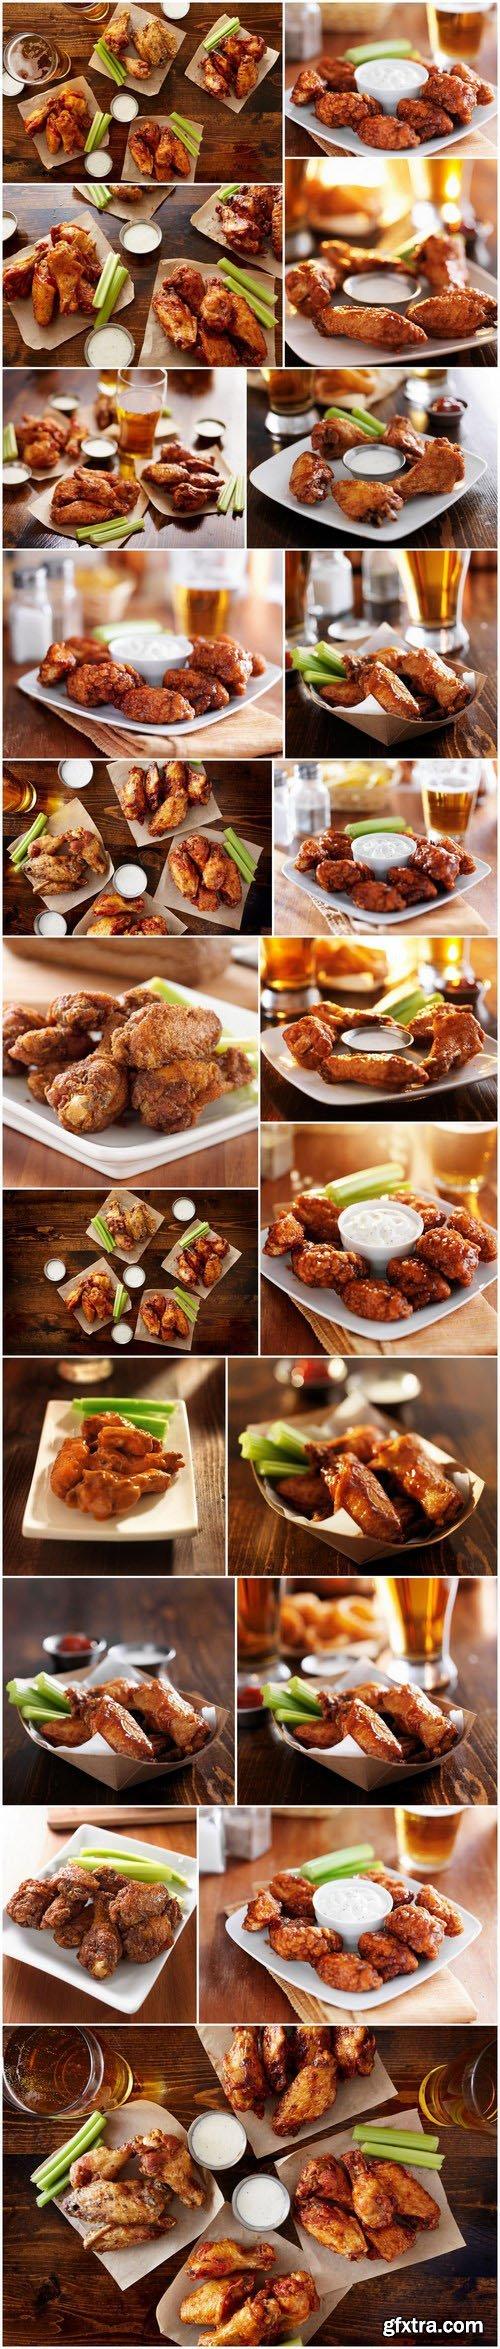 Buffalo barbecue hot chicken wings around ranch sauce - 21xUHQ JPEG